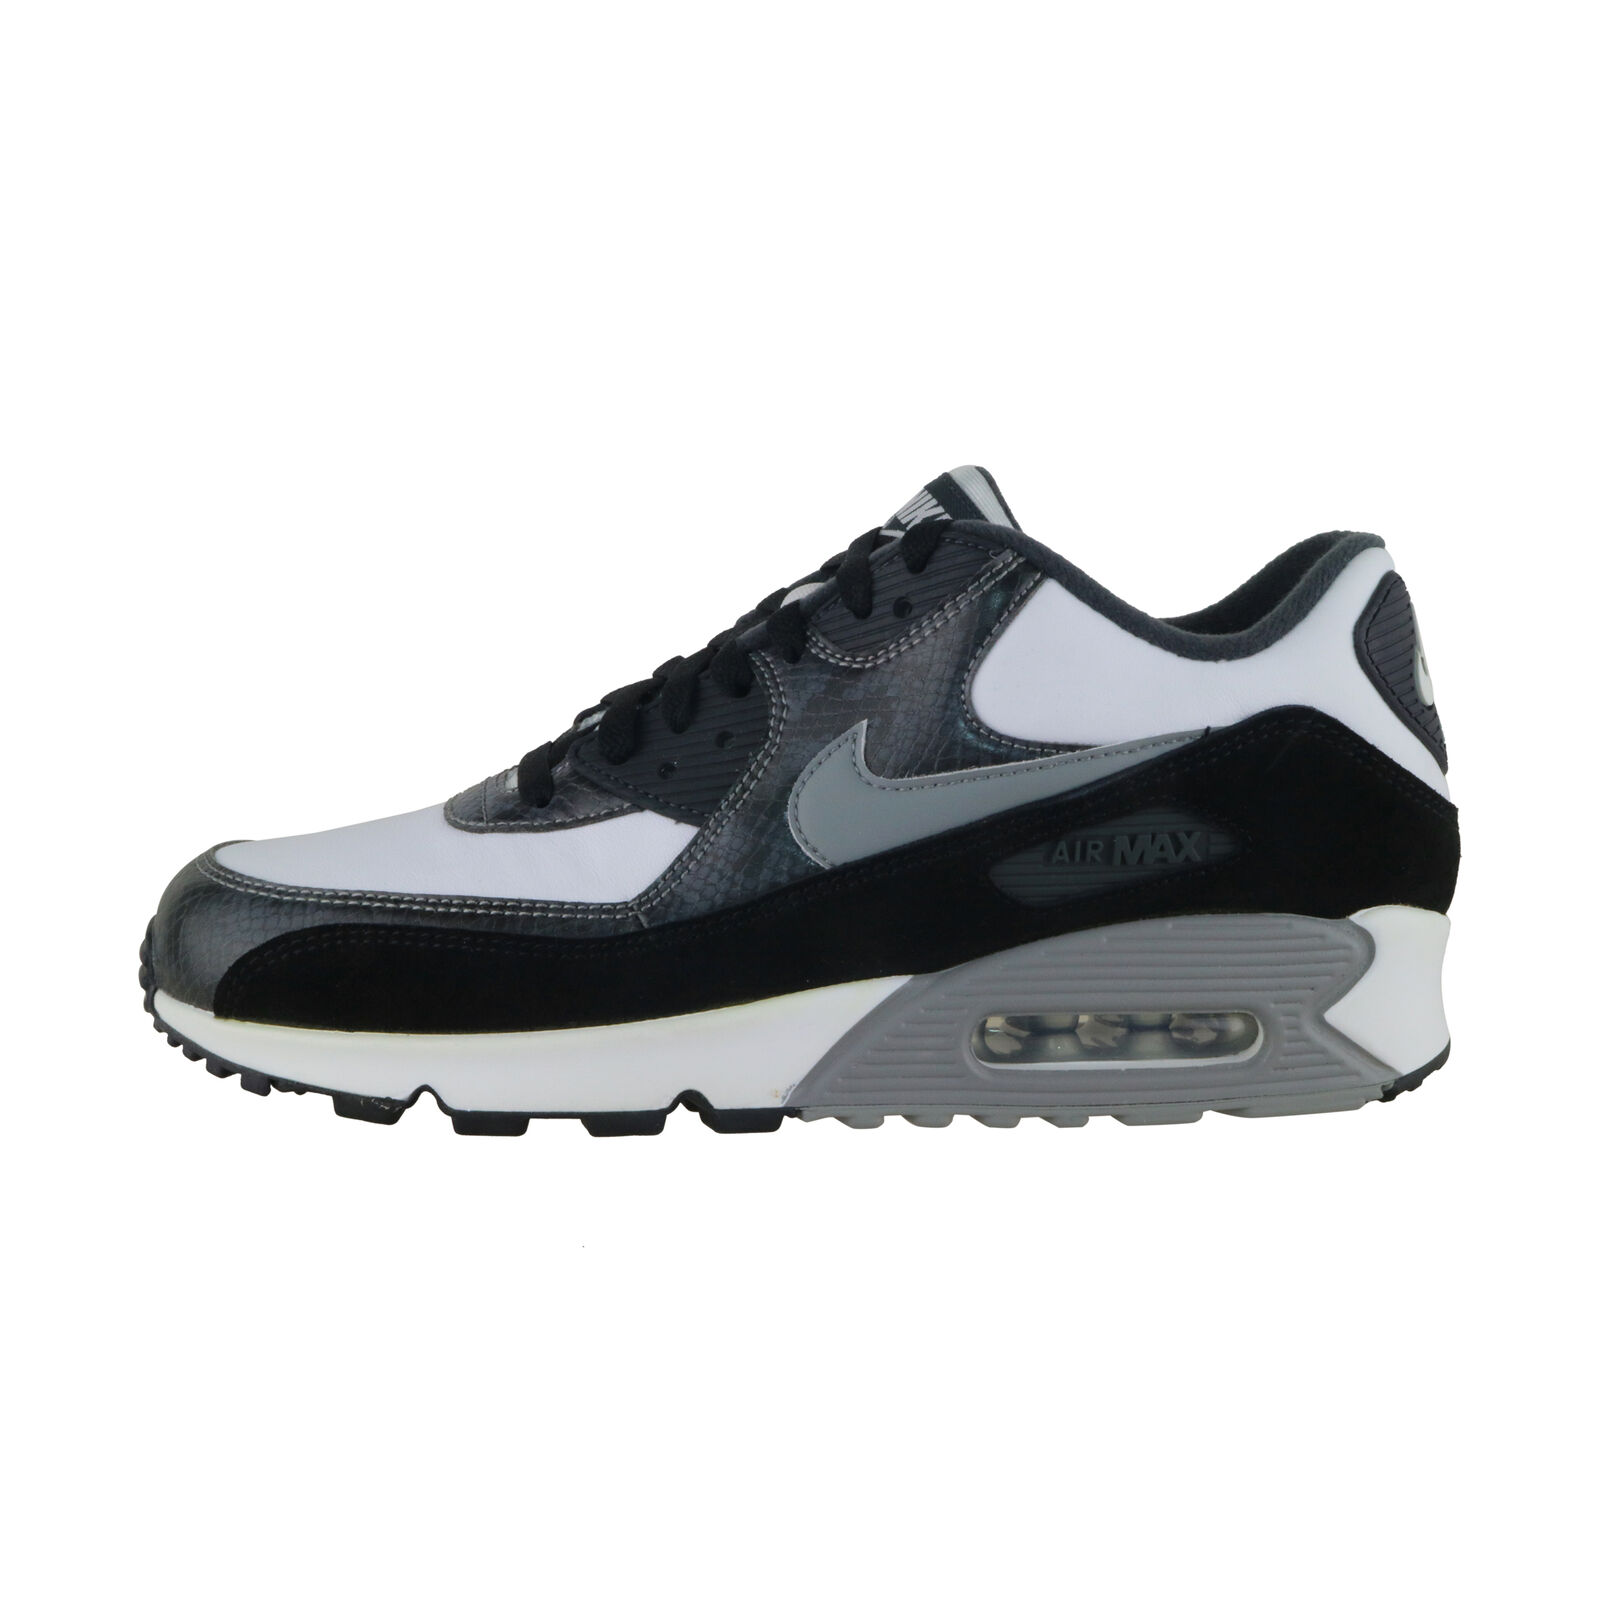 Details about Nike Air Max 90 Qs WhiteGrey CD0916 100